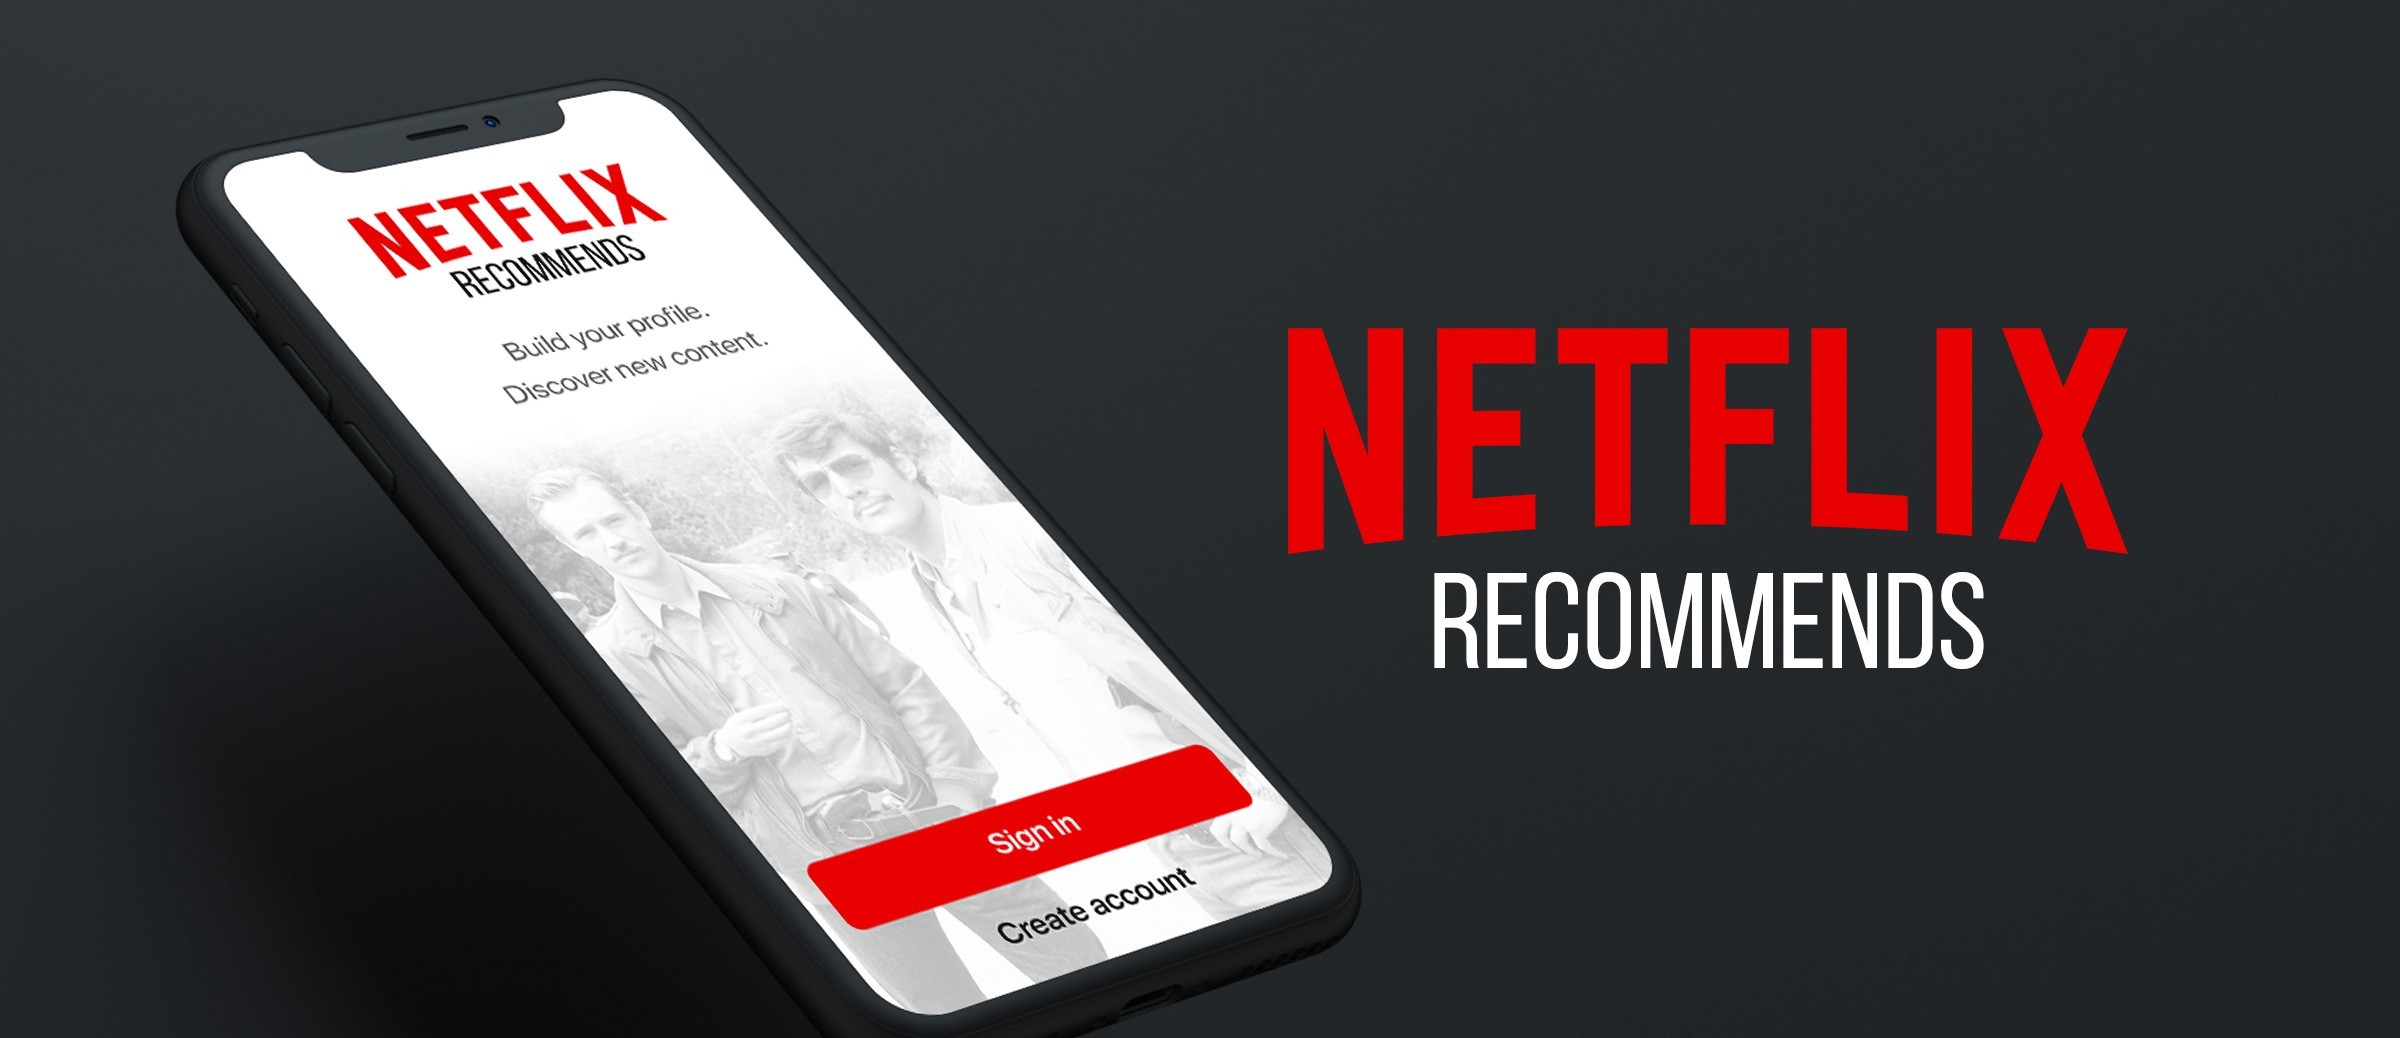 Netflix - OTT platform